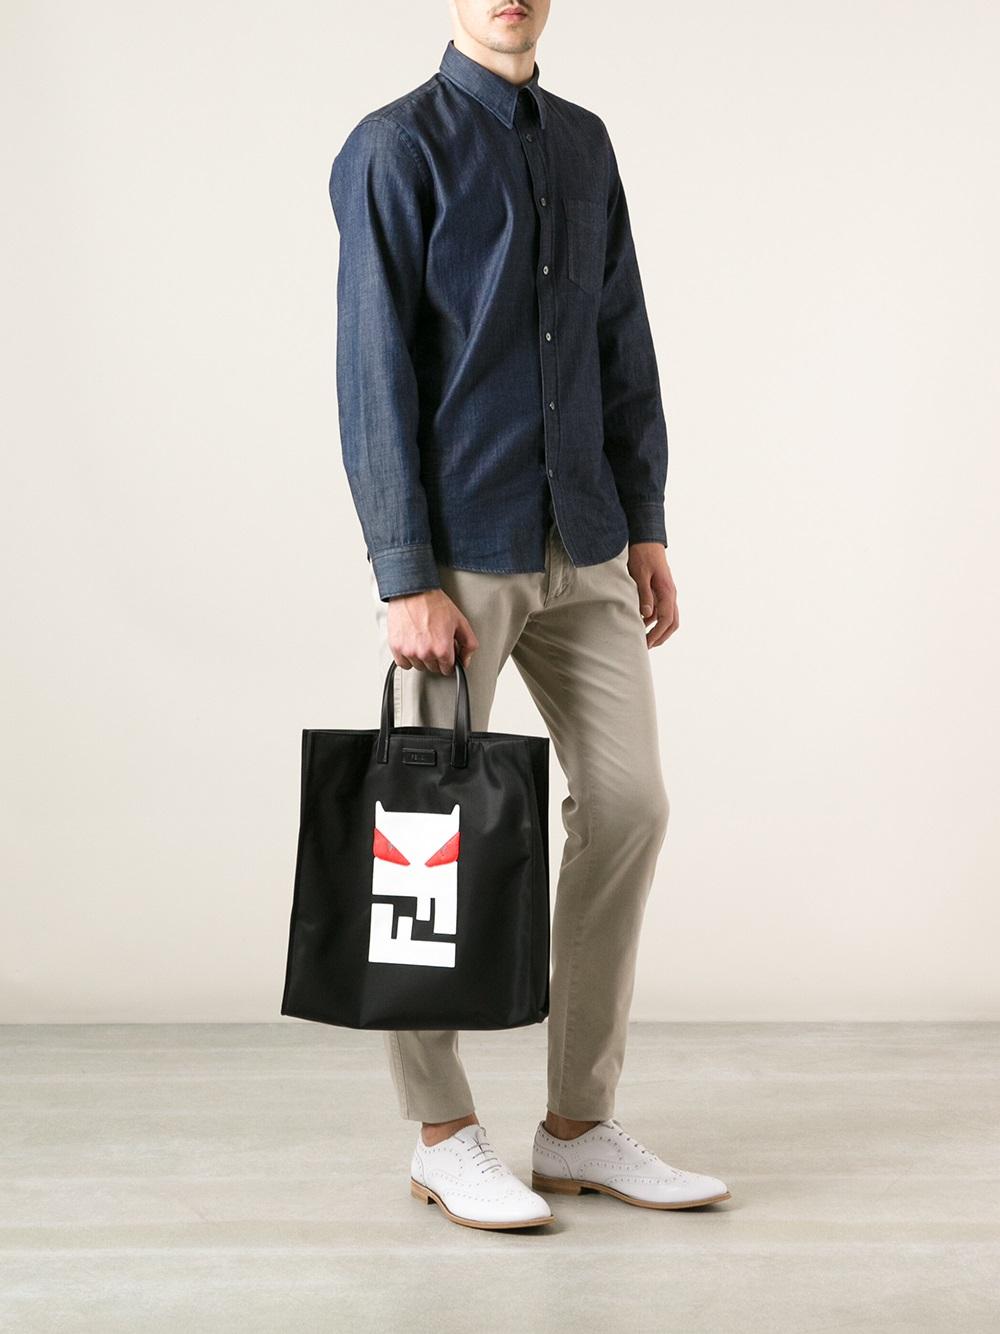 ... free shipping lyst fendi bag bugs tote in black for men 4dd7e 262b7 424e46b454949